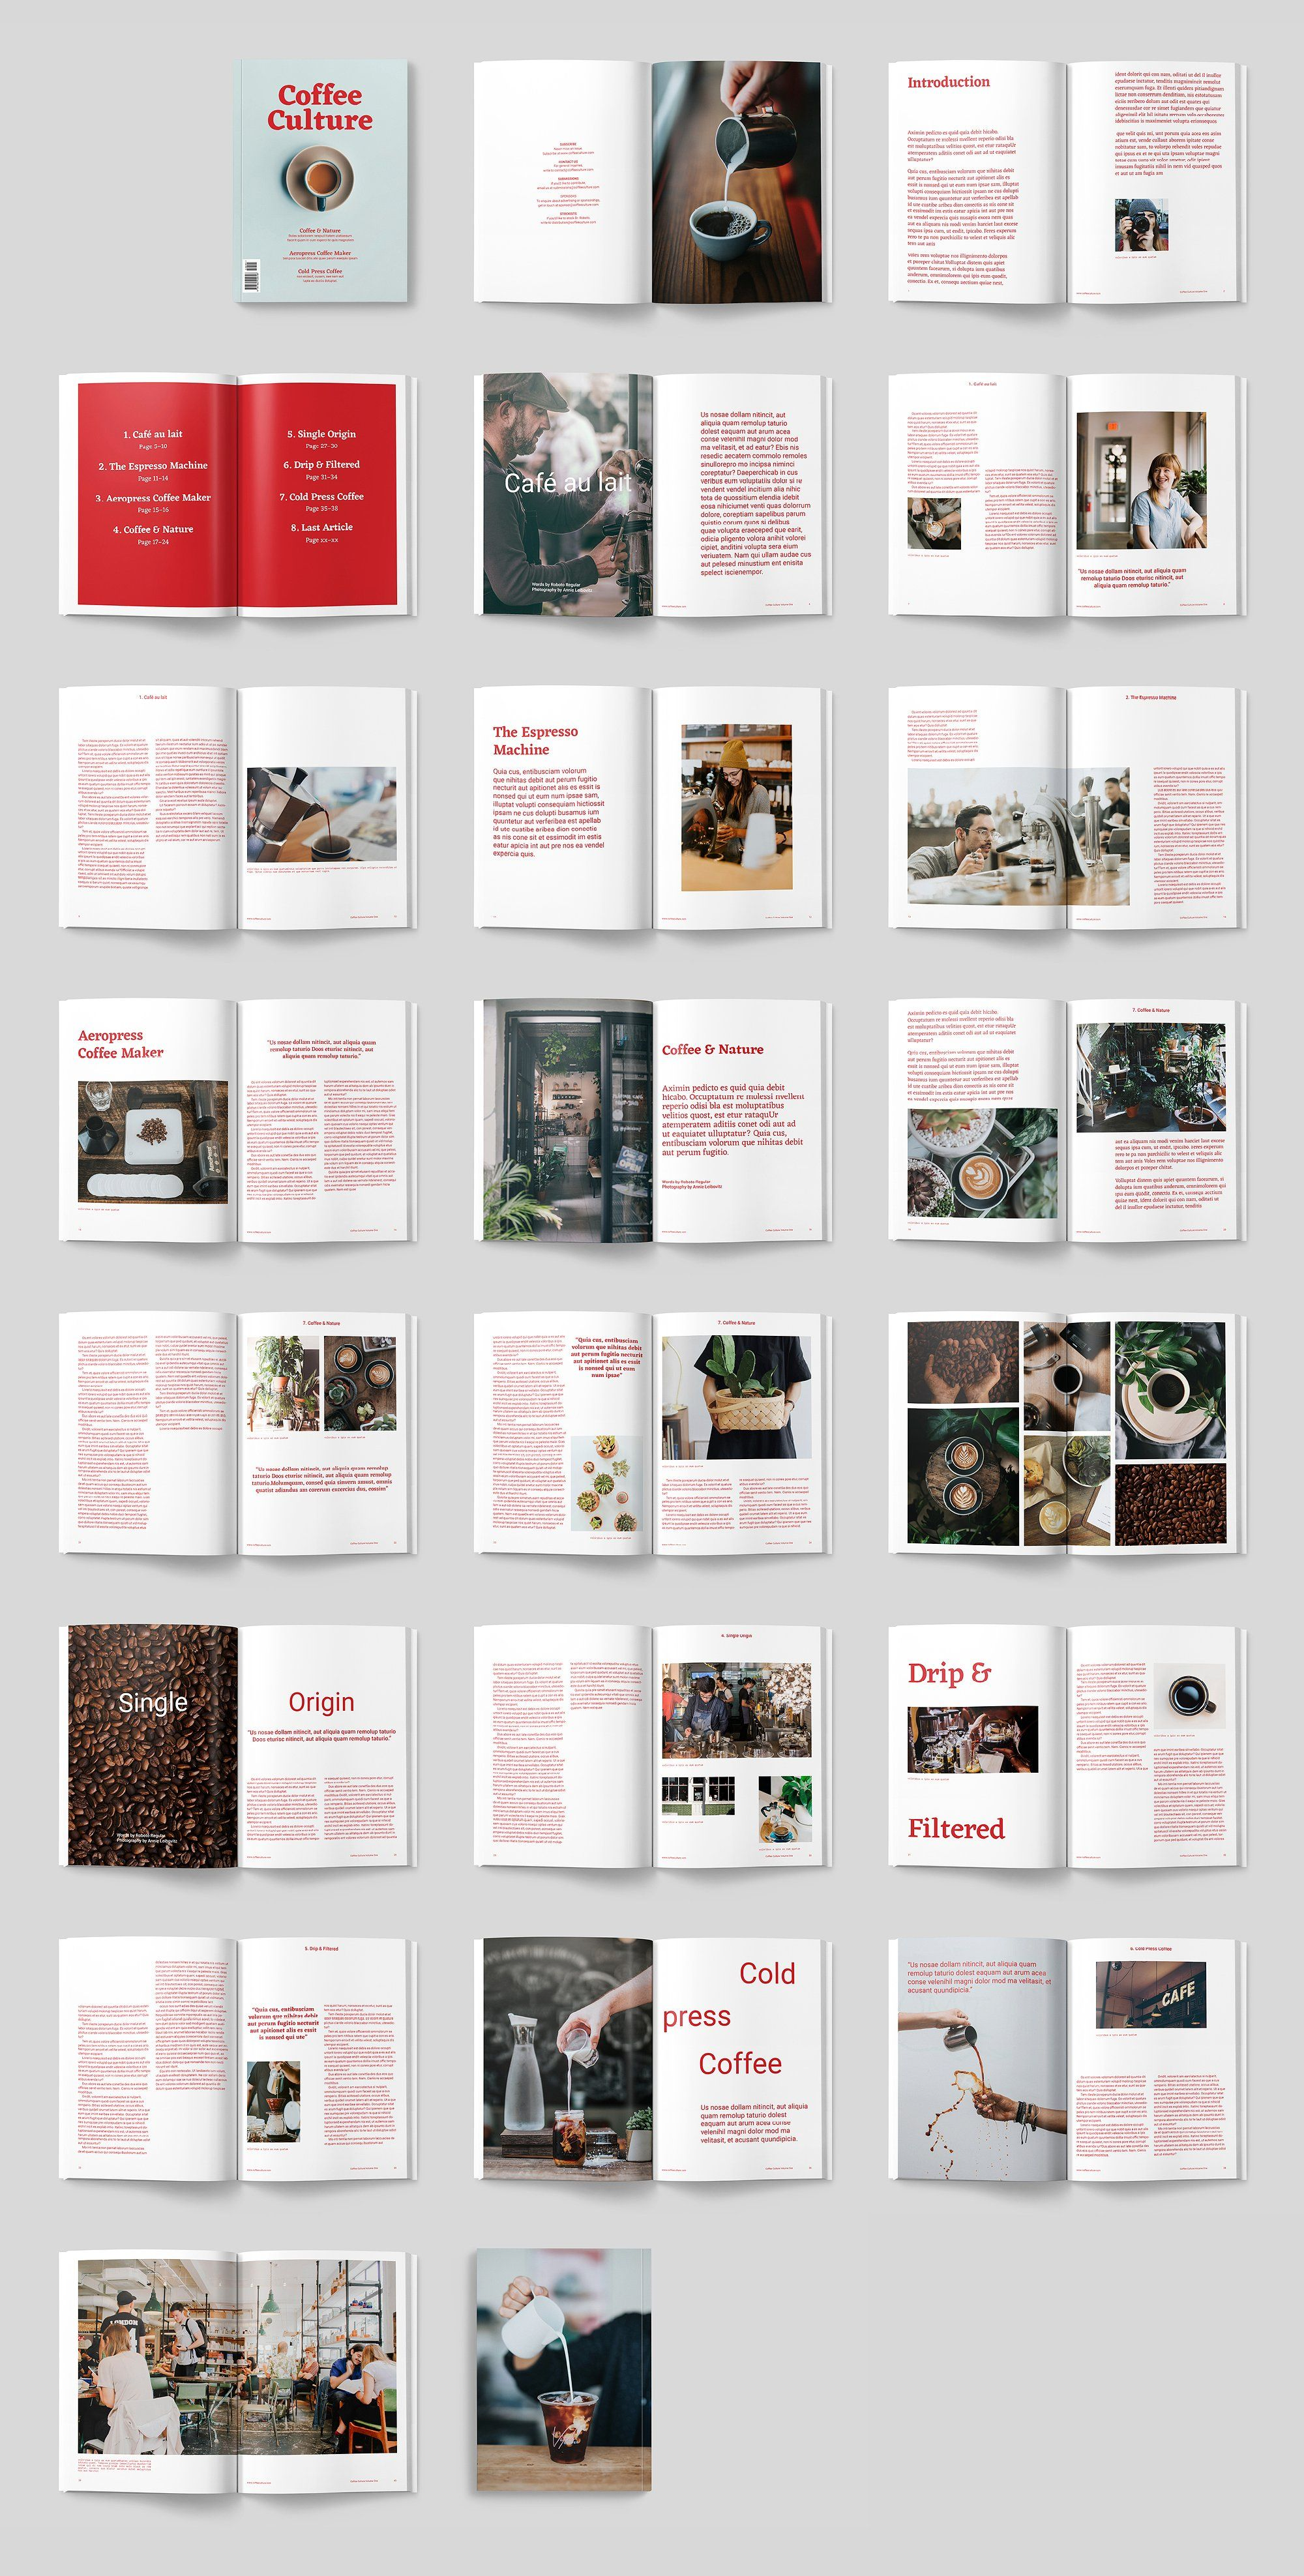 Coffee Culture Magazine By Thomasmakesstuff On Creativemarket